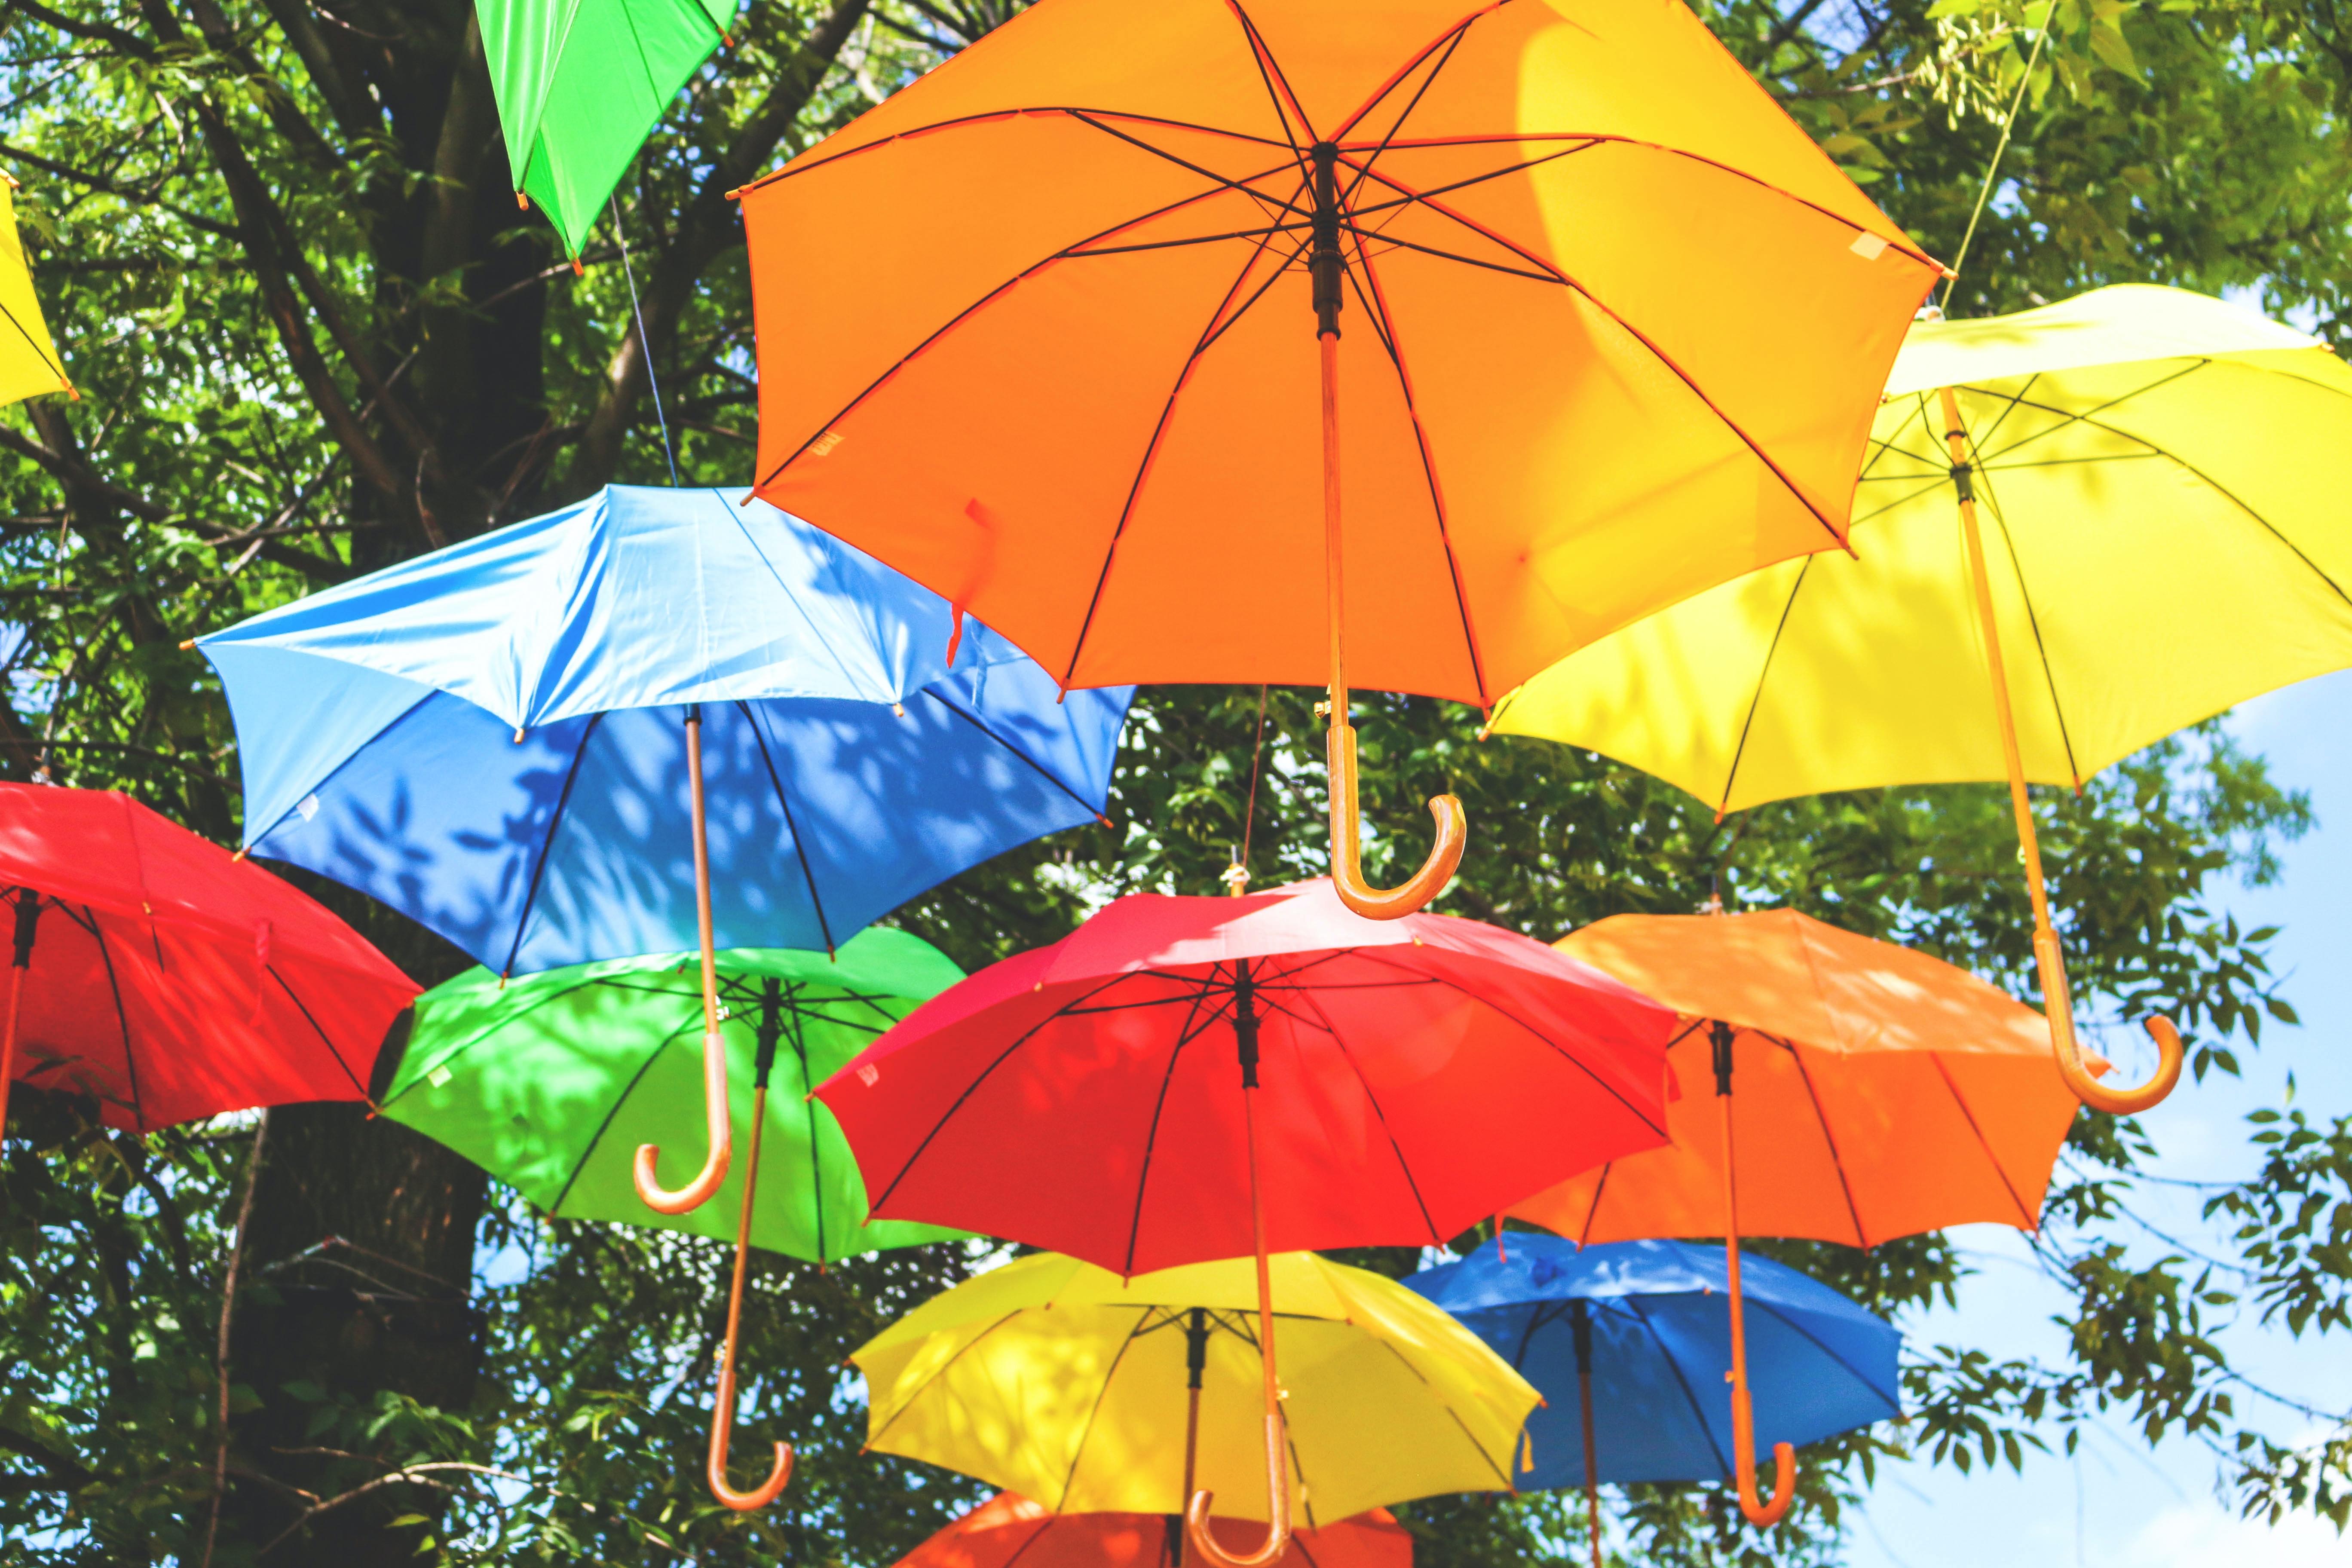 assorted-color hanged umbrellas near tree